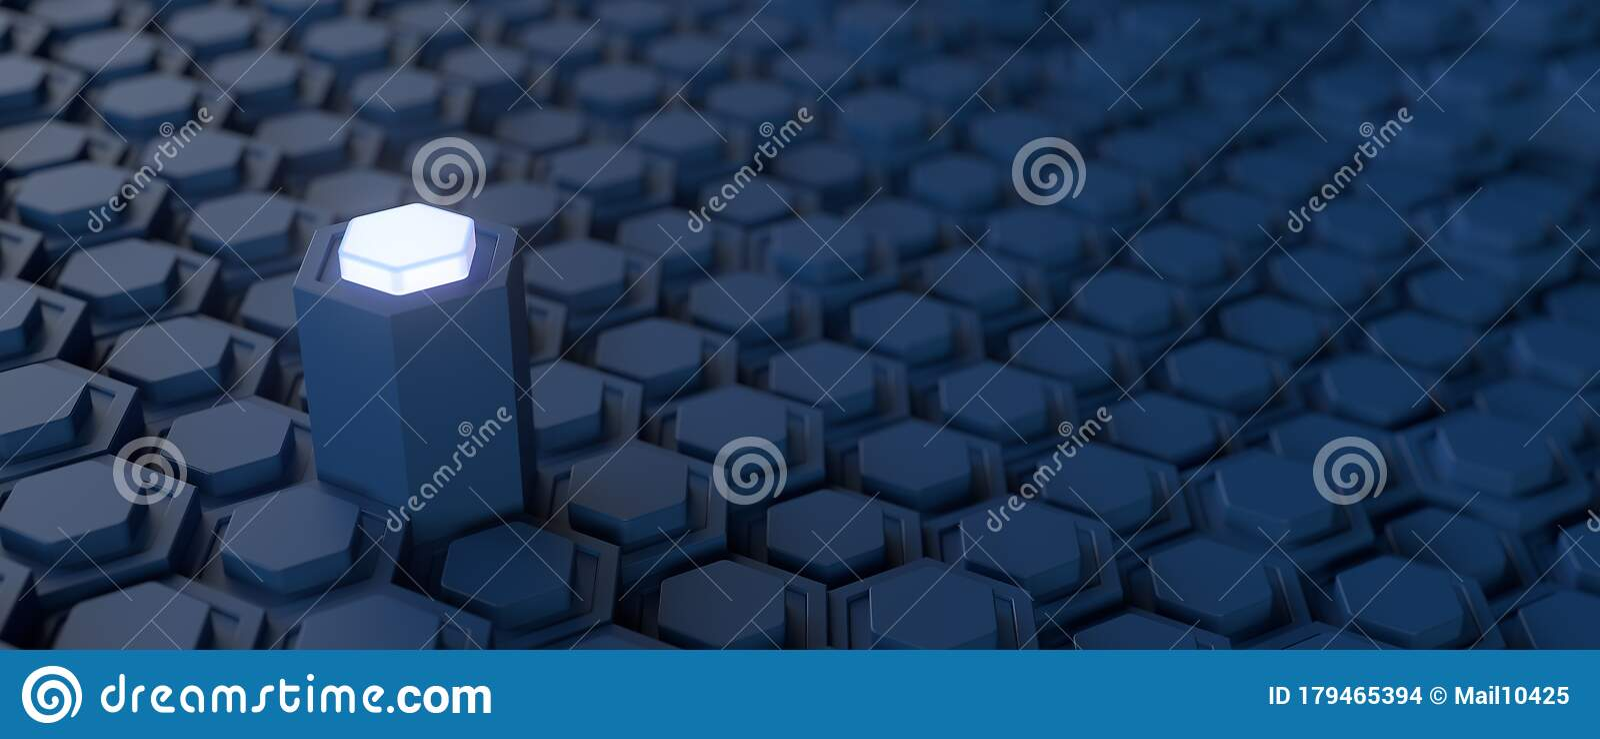 royal navy blue hexagonal tiles abstract background closeup stock illustration illustration of hexagon network 179465394